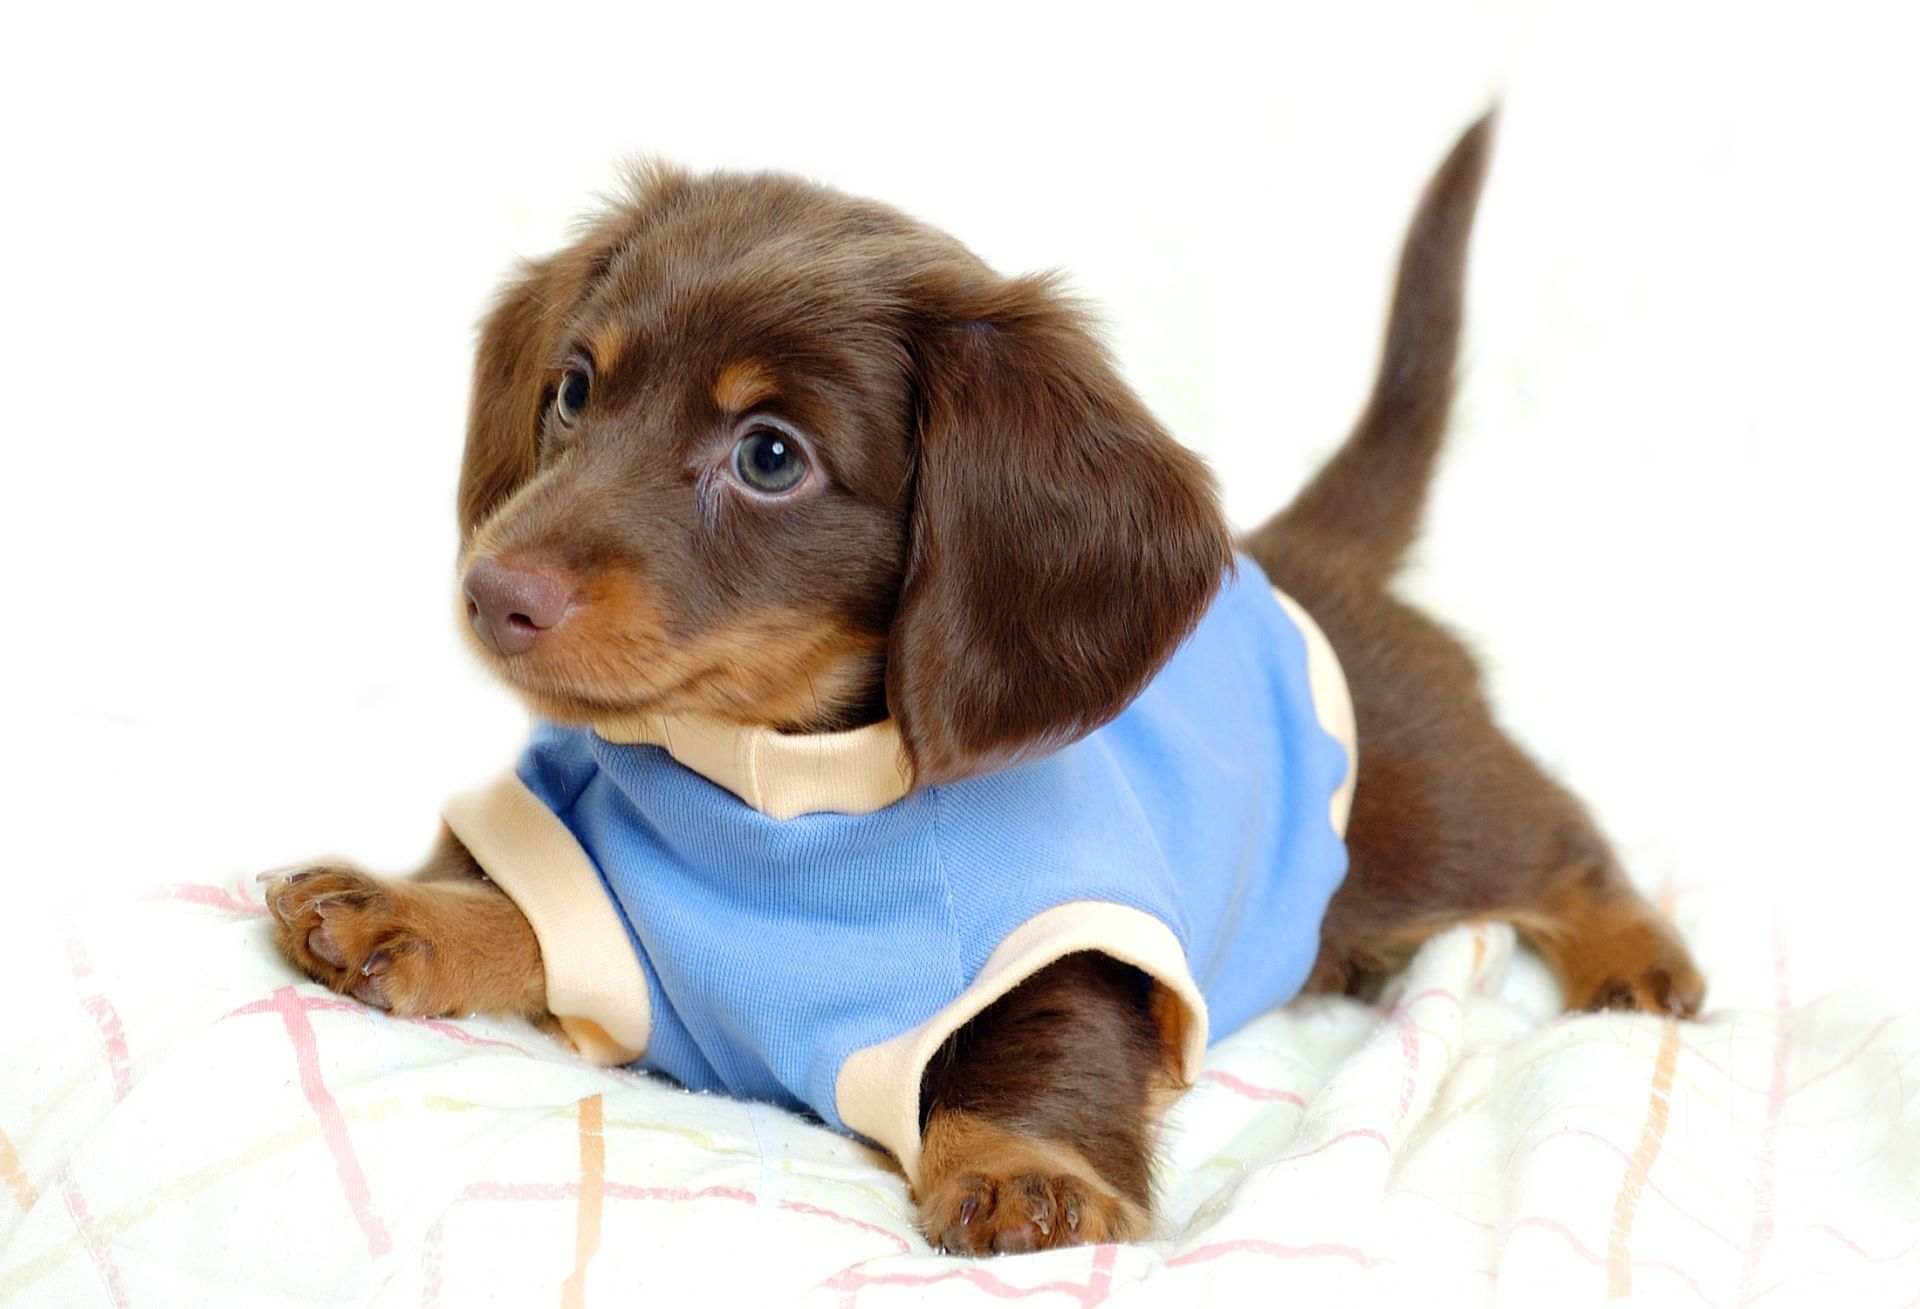 cute dog baby hd wallpaper